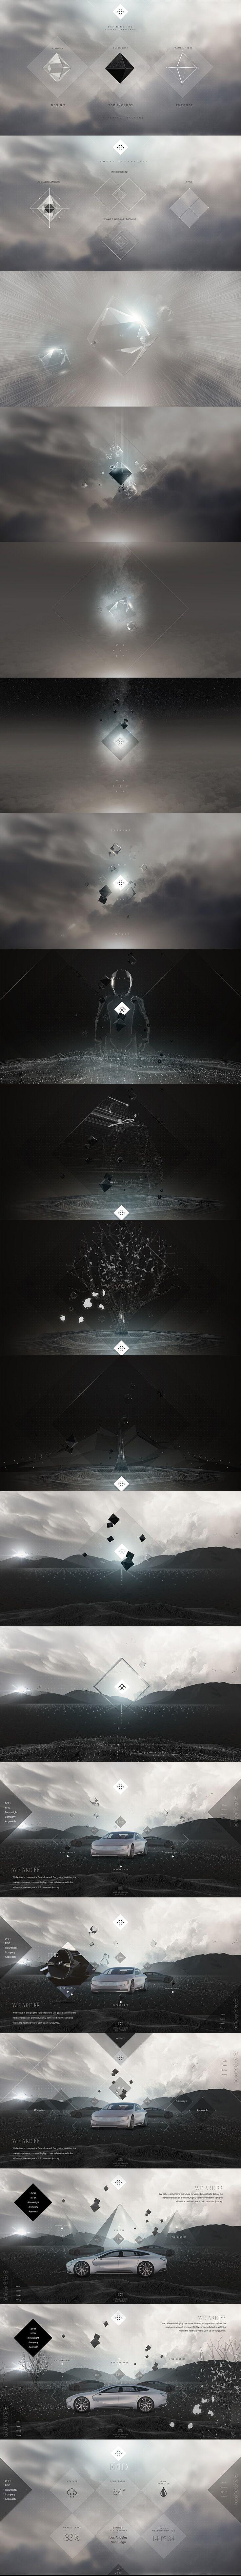 Faraday Future - Interactive design concepts by Eric Jordan [Set 3] #design #webdesign #website